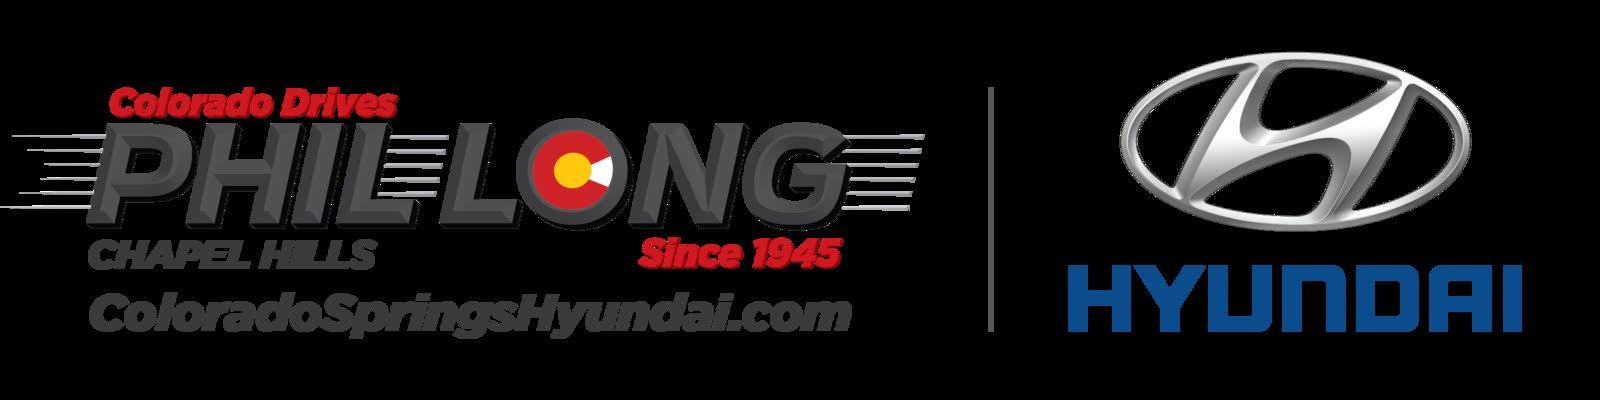 Phil Long Hyundai >> Phil Long Hyundai Of Chapel Hills Colorado Springs Co Read